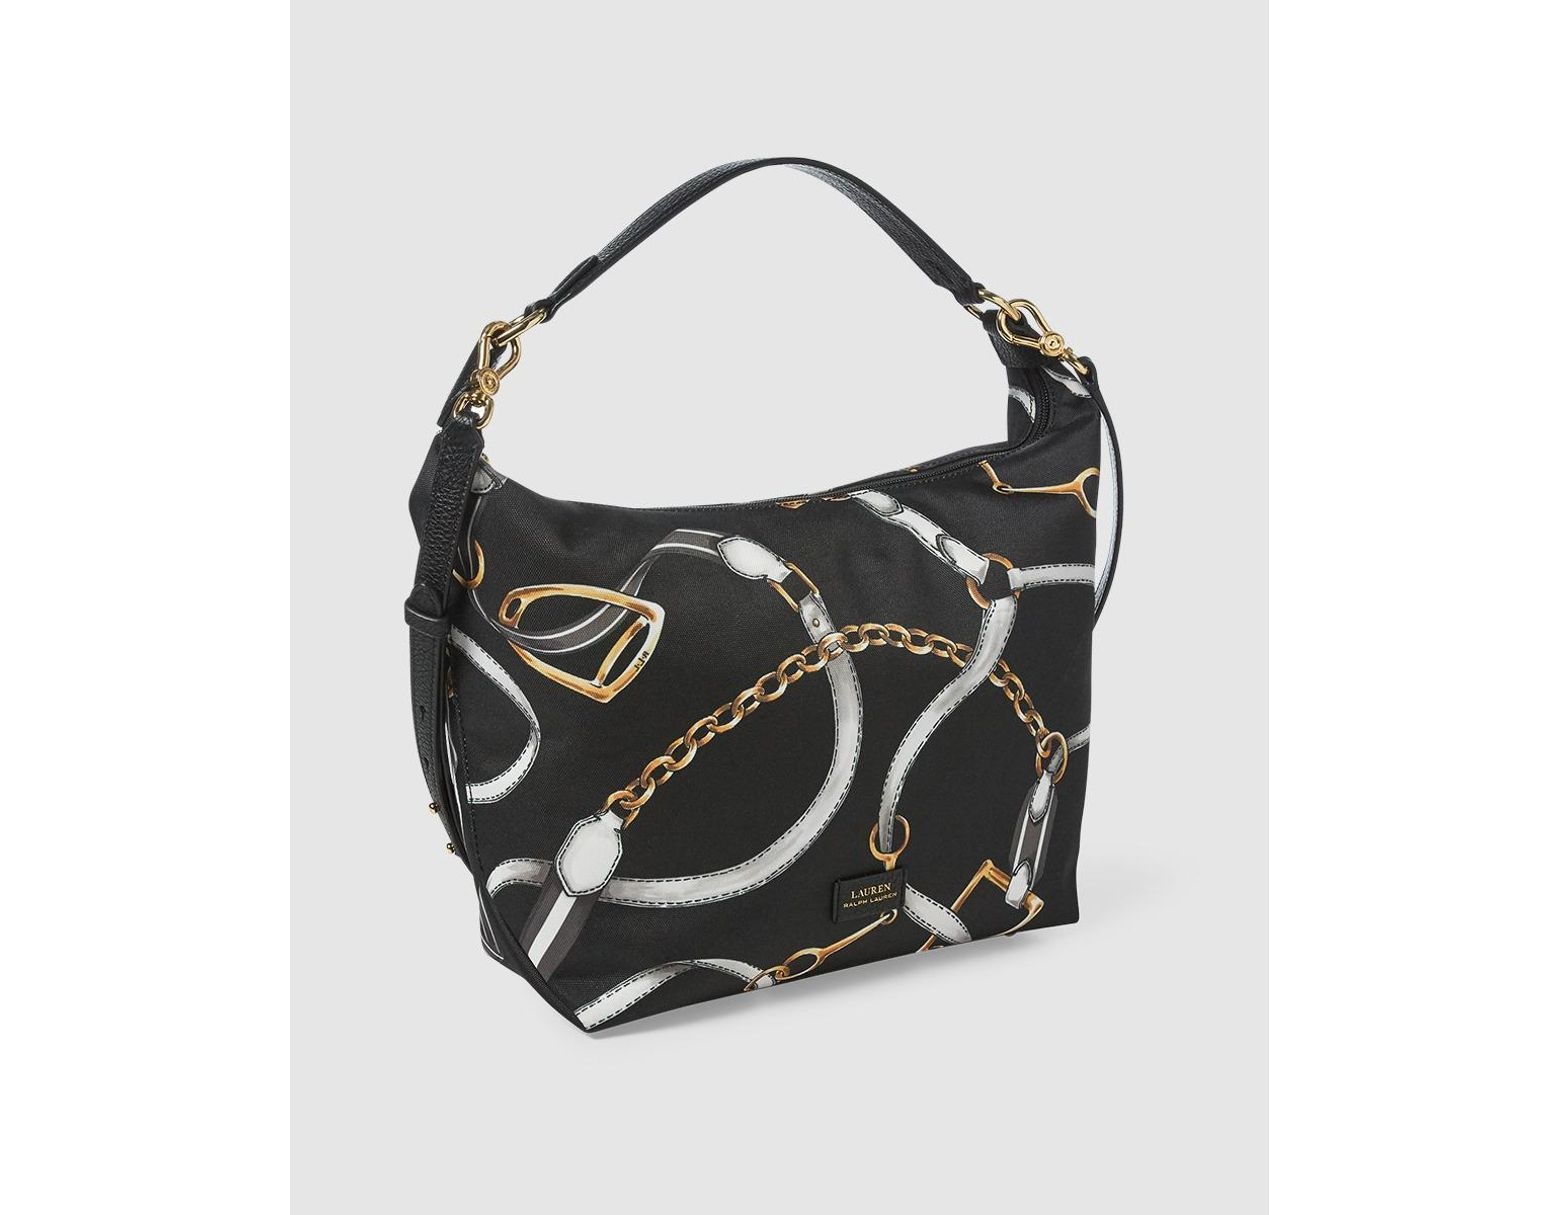 732d0bbb5 Lauren by Ralph Lauren Black Nylon Hobo Bag With Chain Print in Black - Lyst